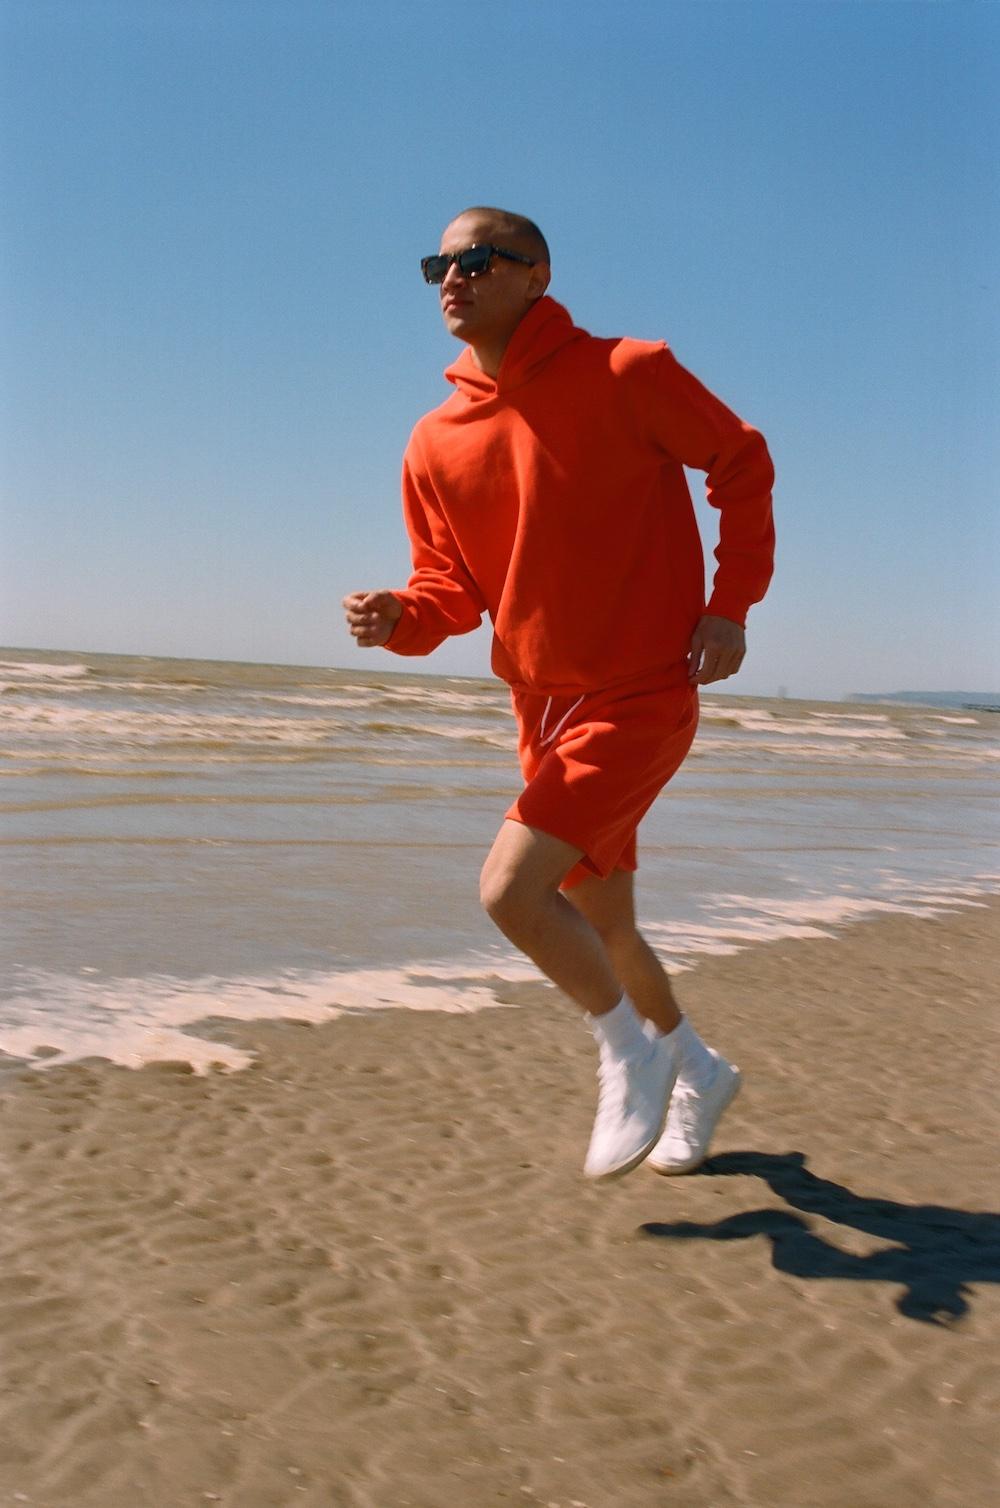 Men's Fitness. Ph: Paul Vickery